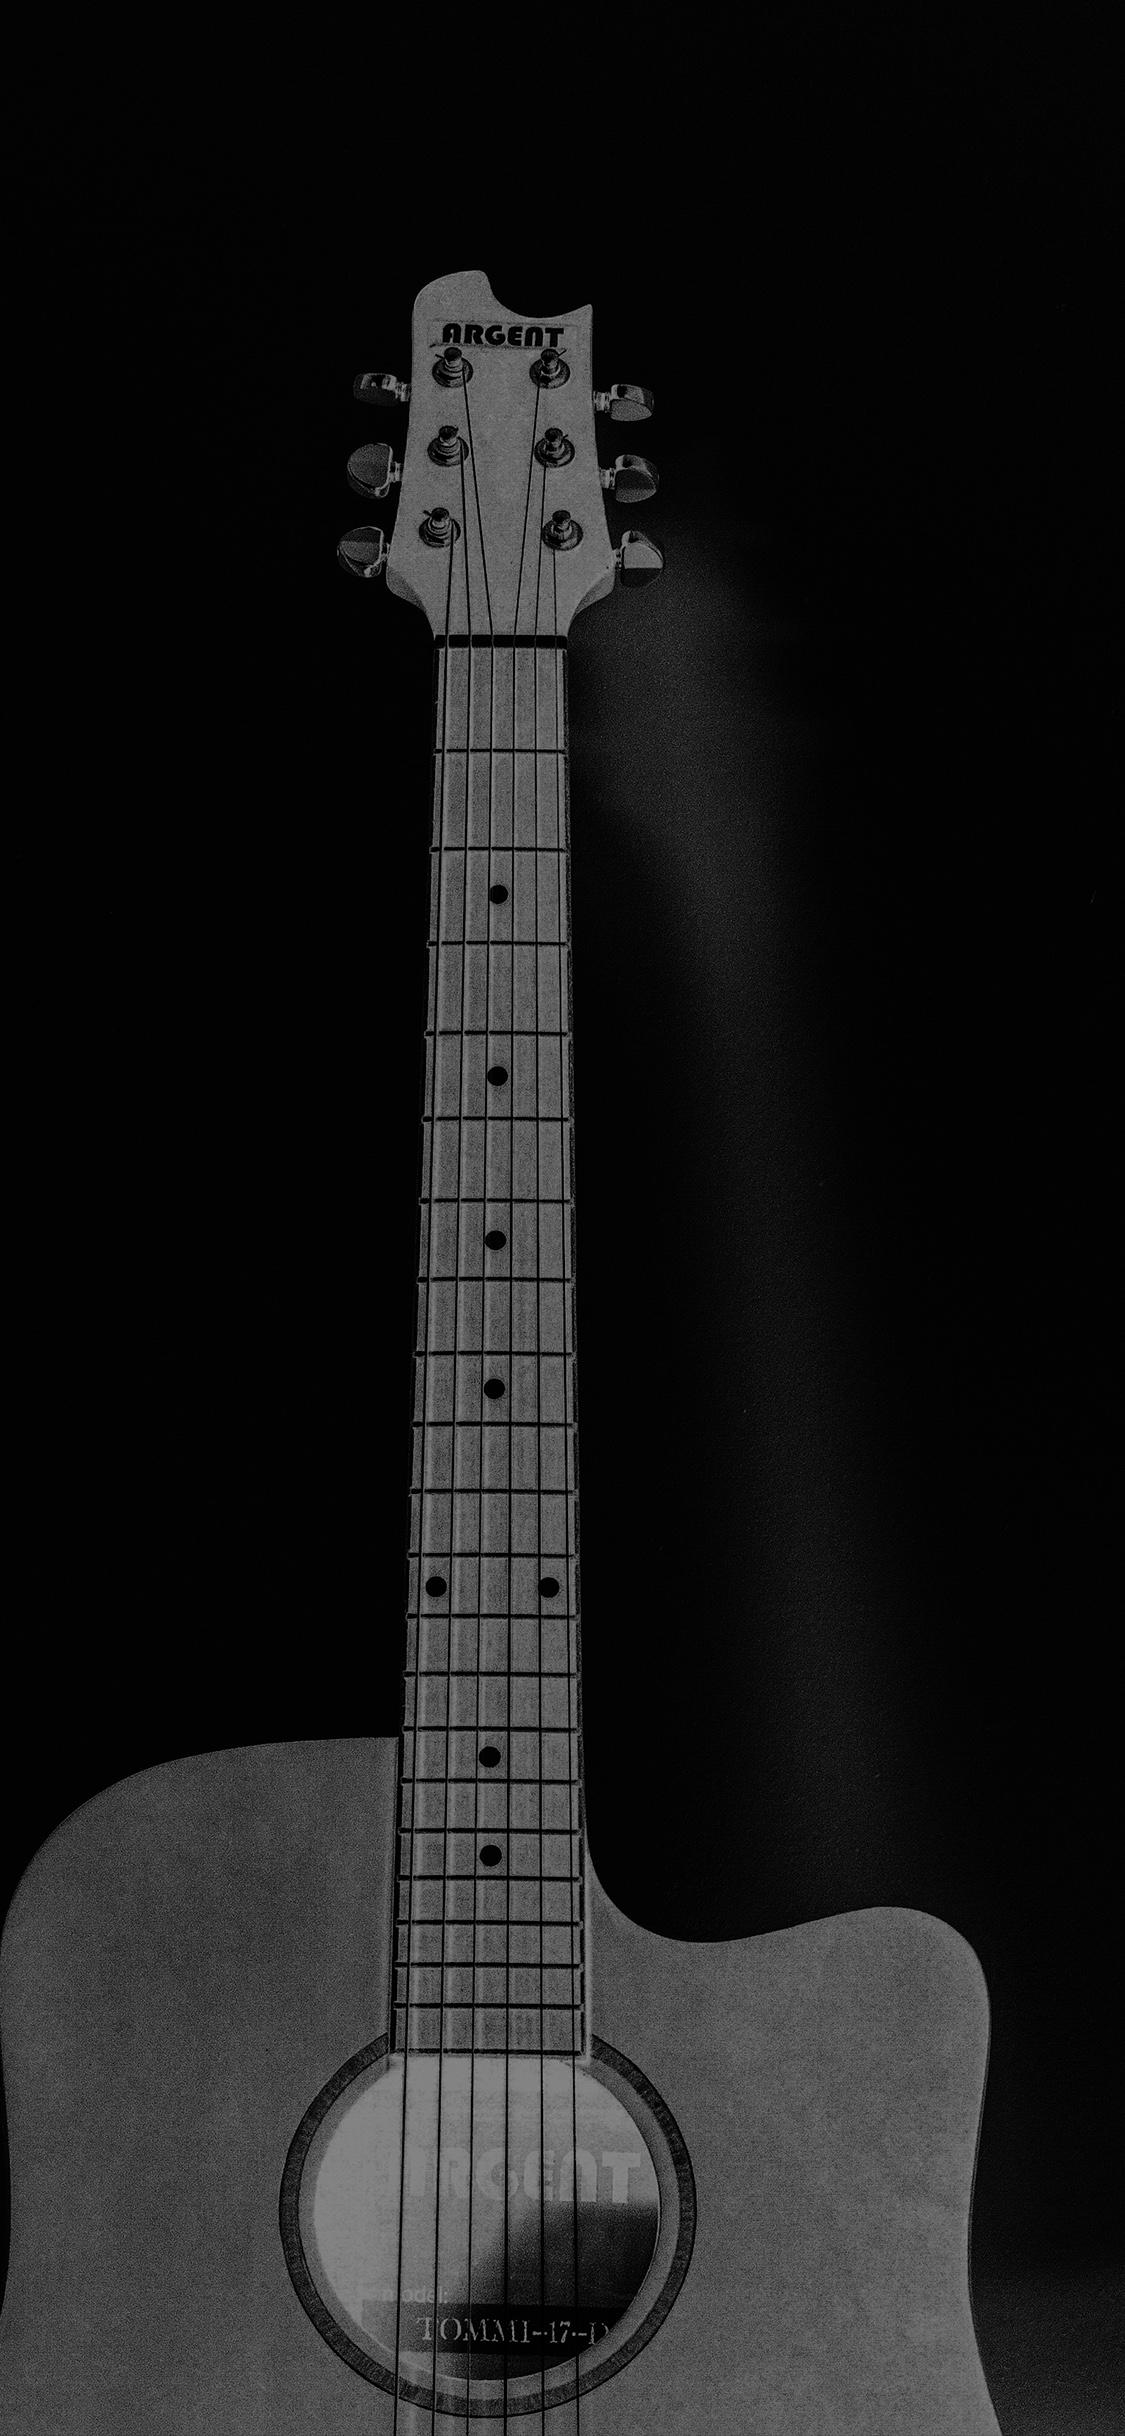 iPhoneXpapers.com-Apple-iPhone-wallpaper-mw80-guitar-art-bw-dark-music-song-black